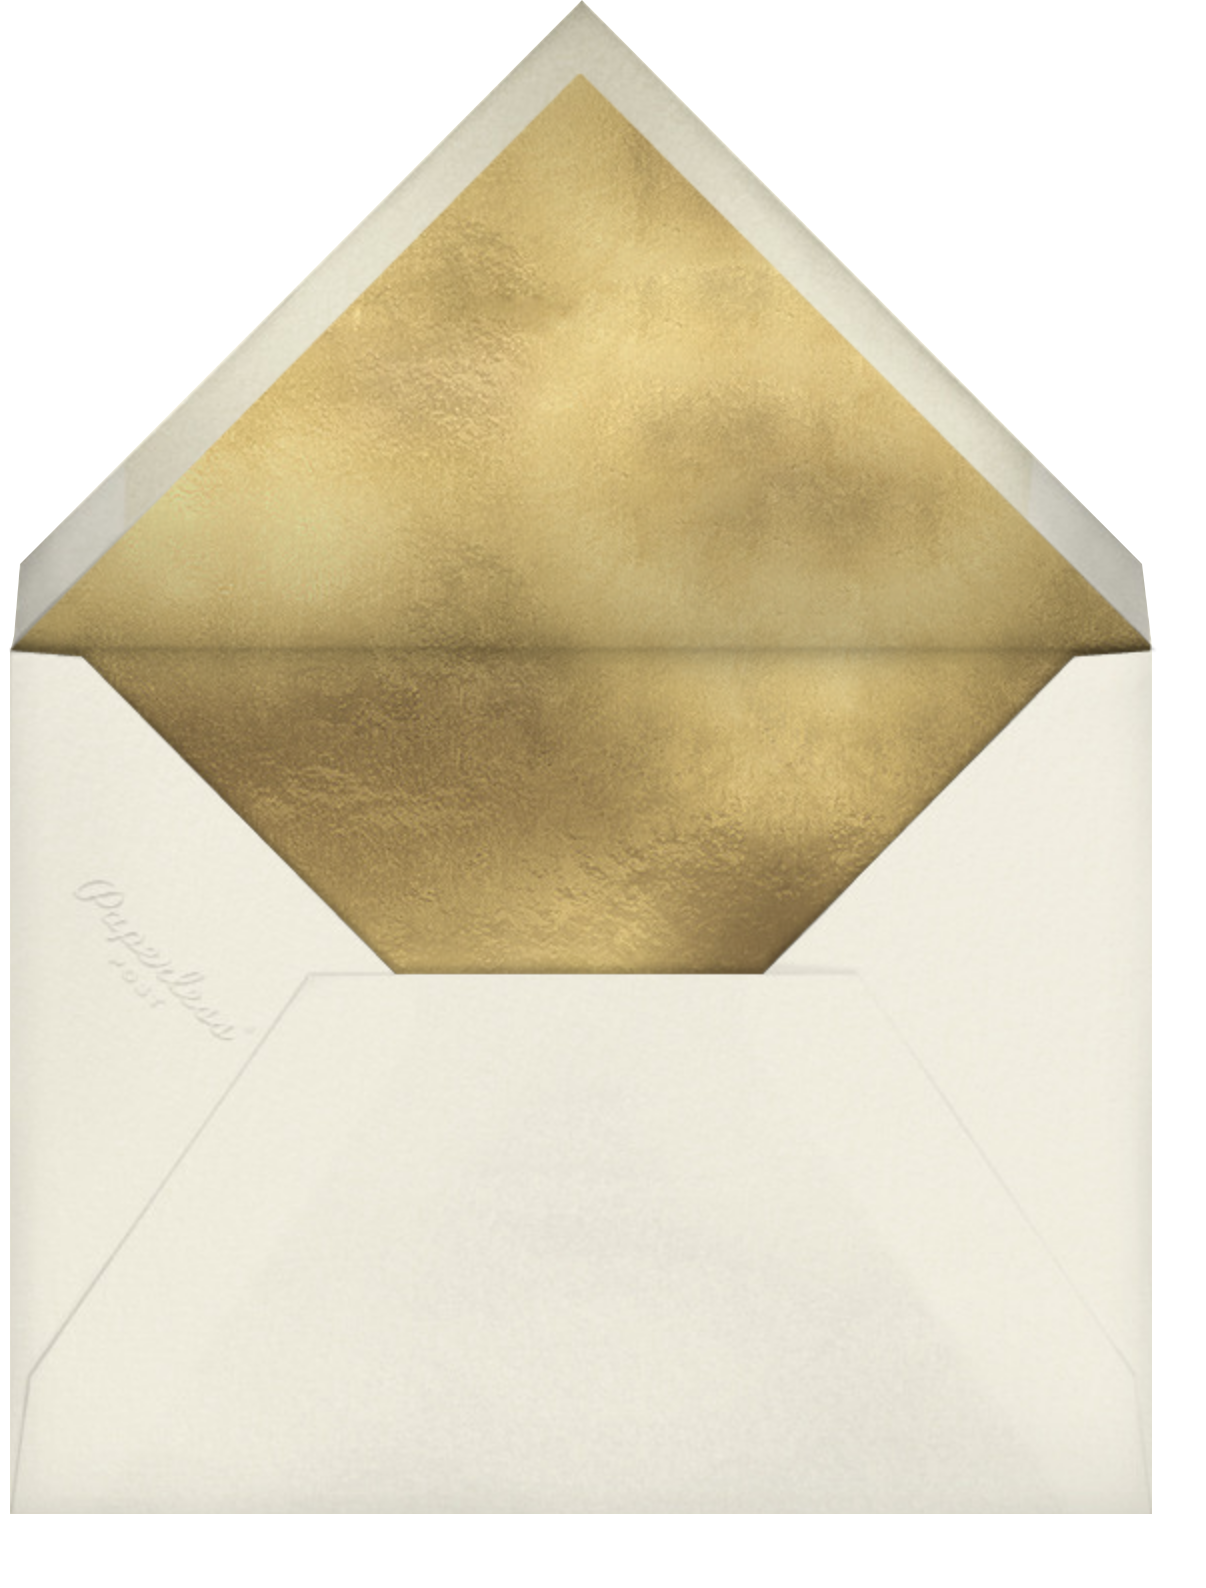 Confetti Ceremony - kate spade new york - Classic  - envelope back